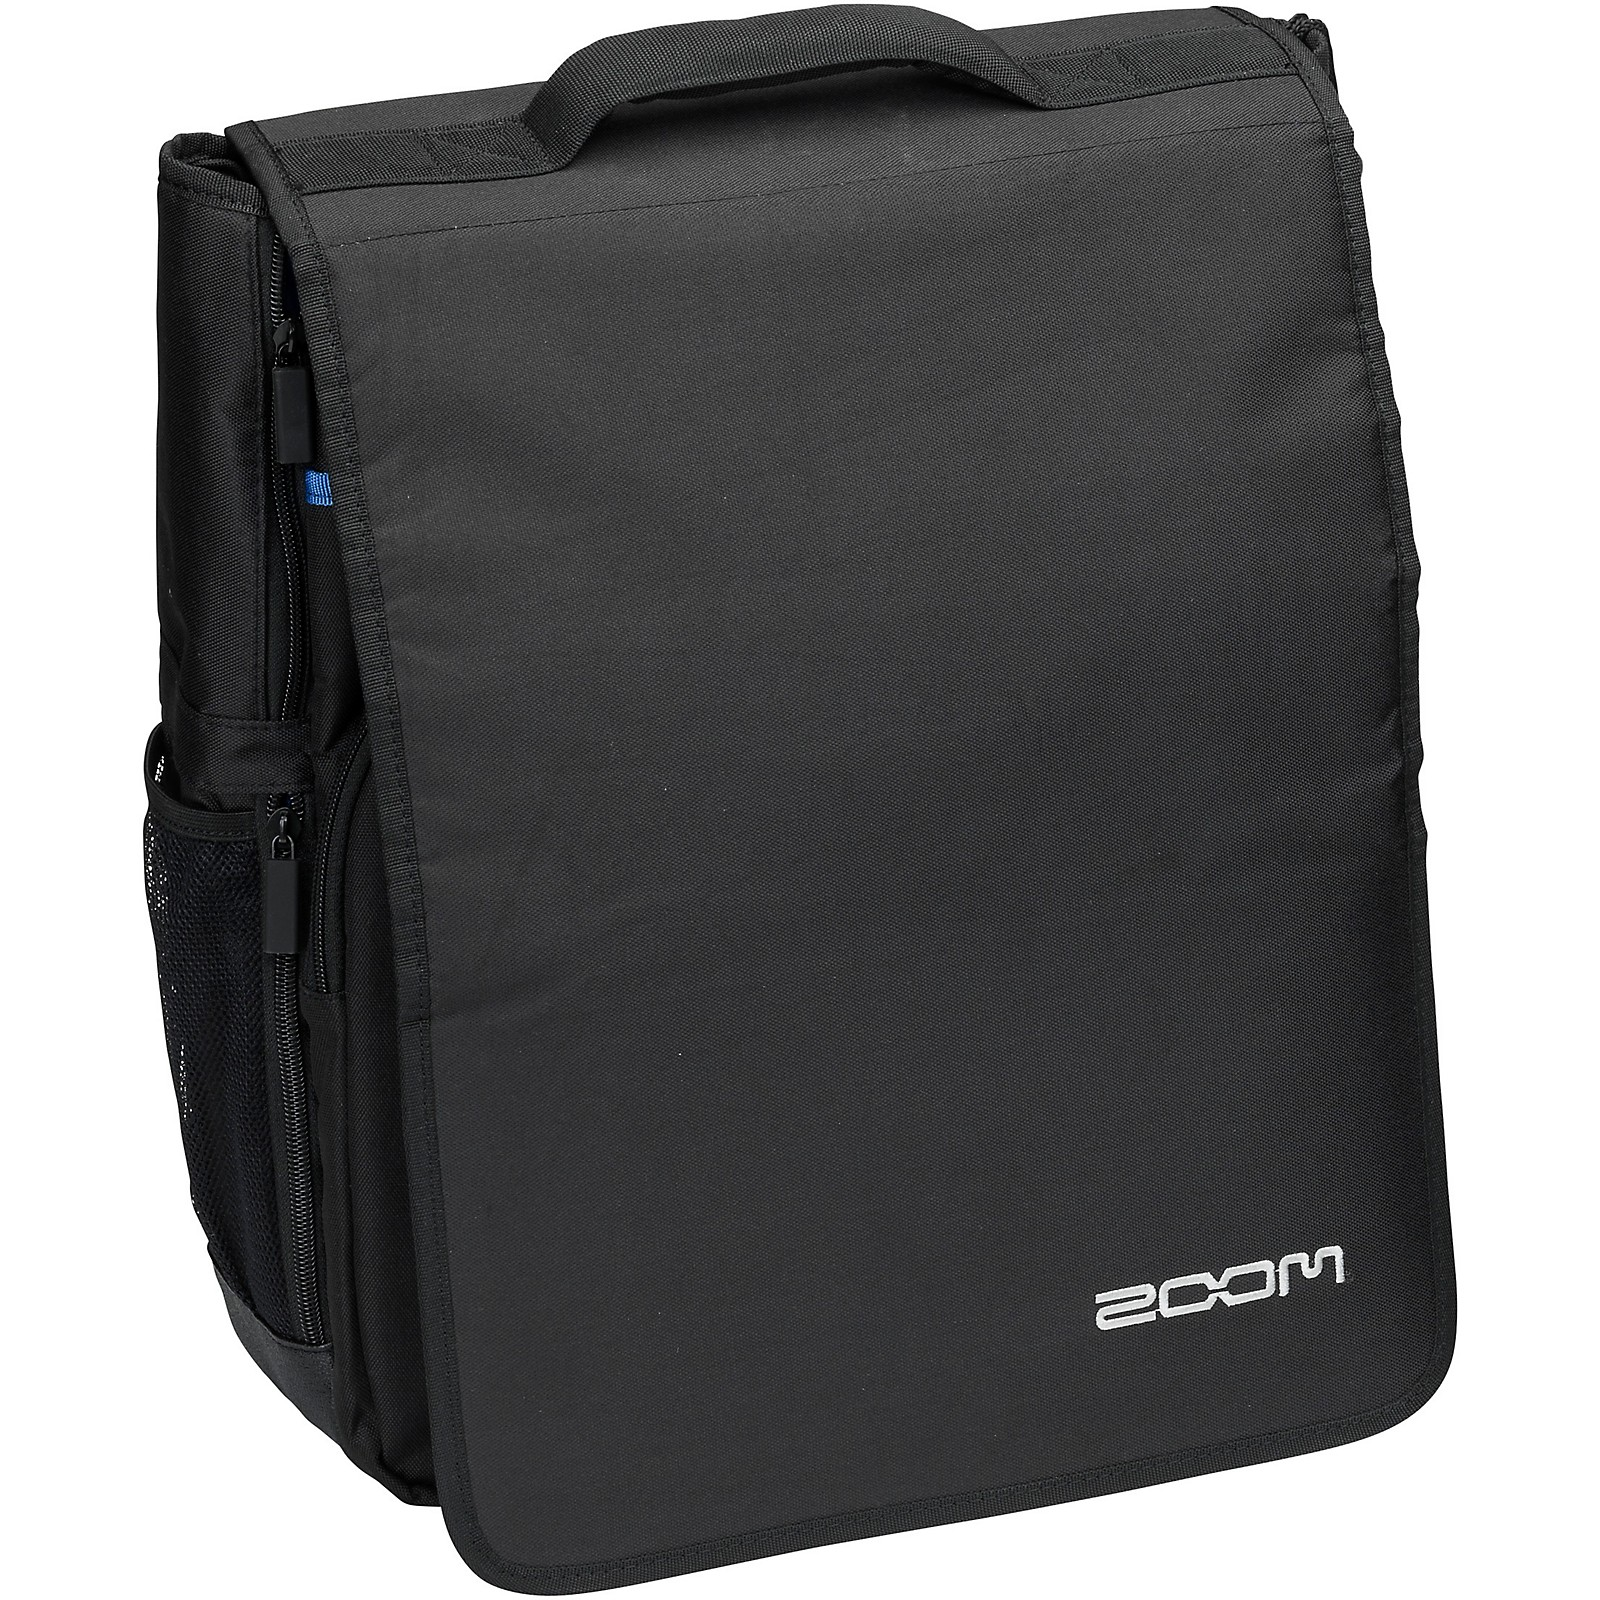 Zoom CBA-96 Creator Bag